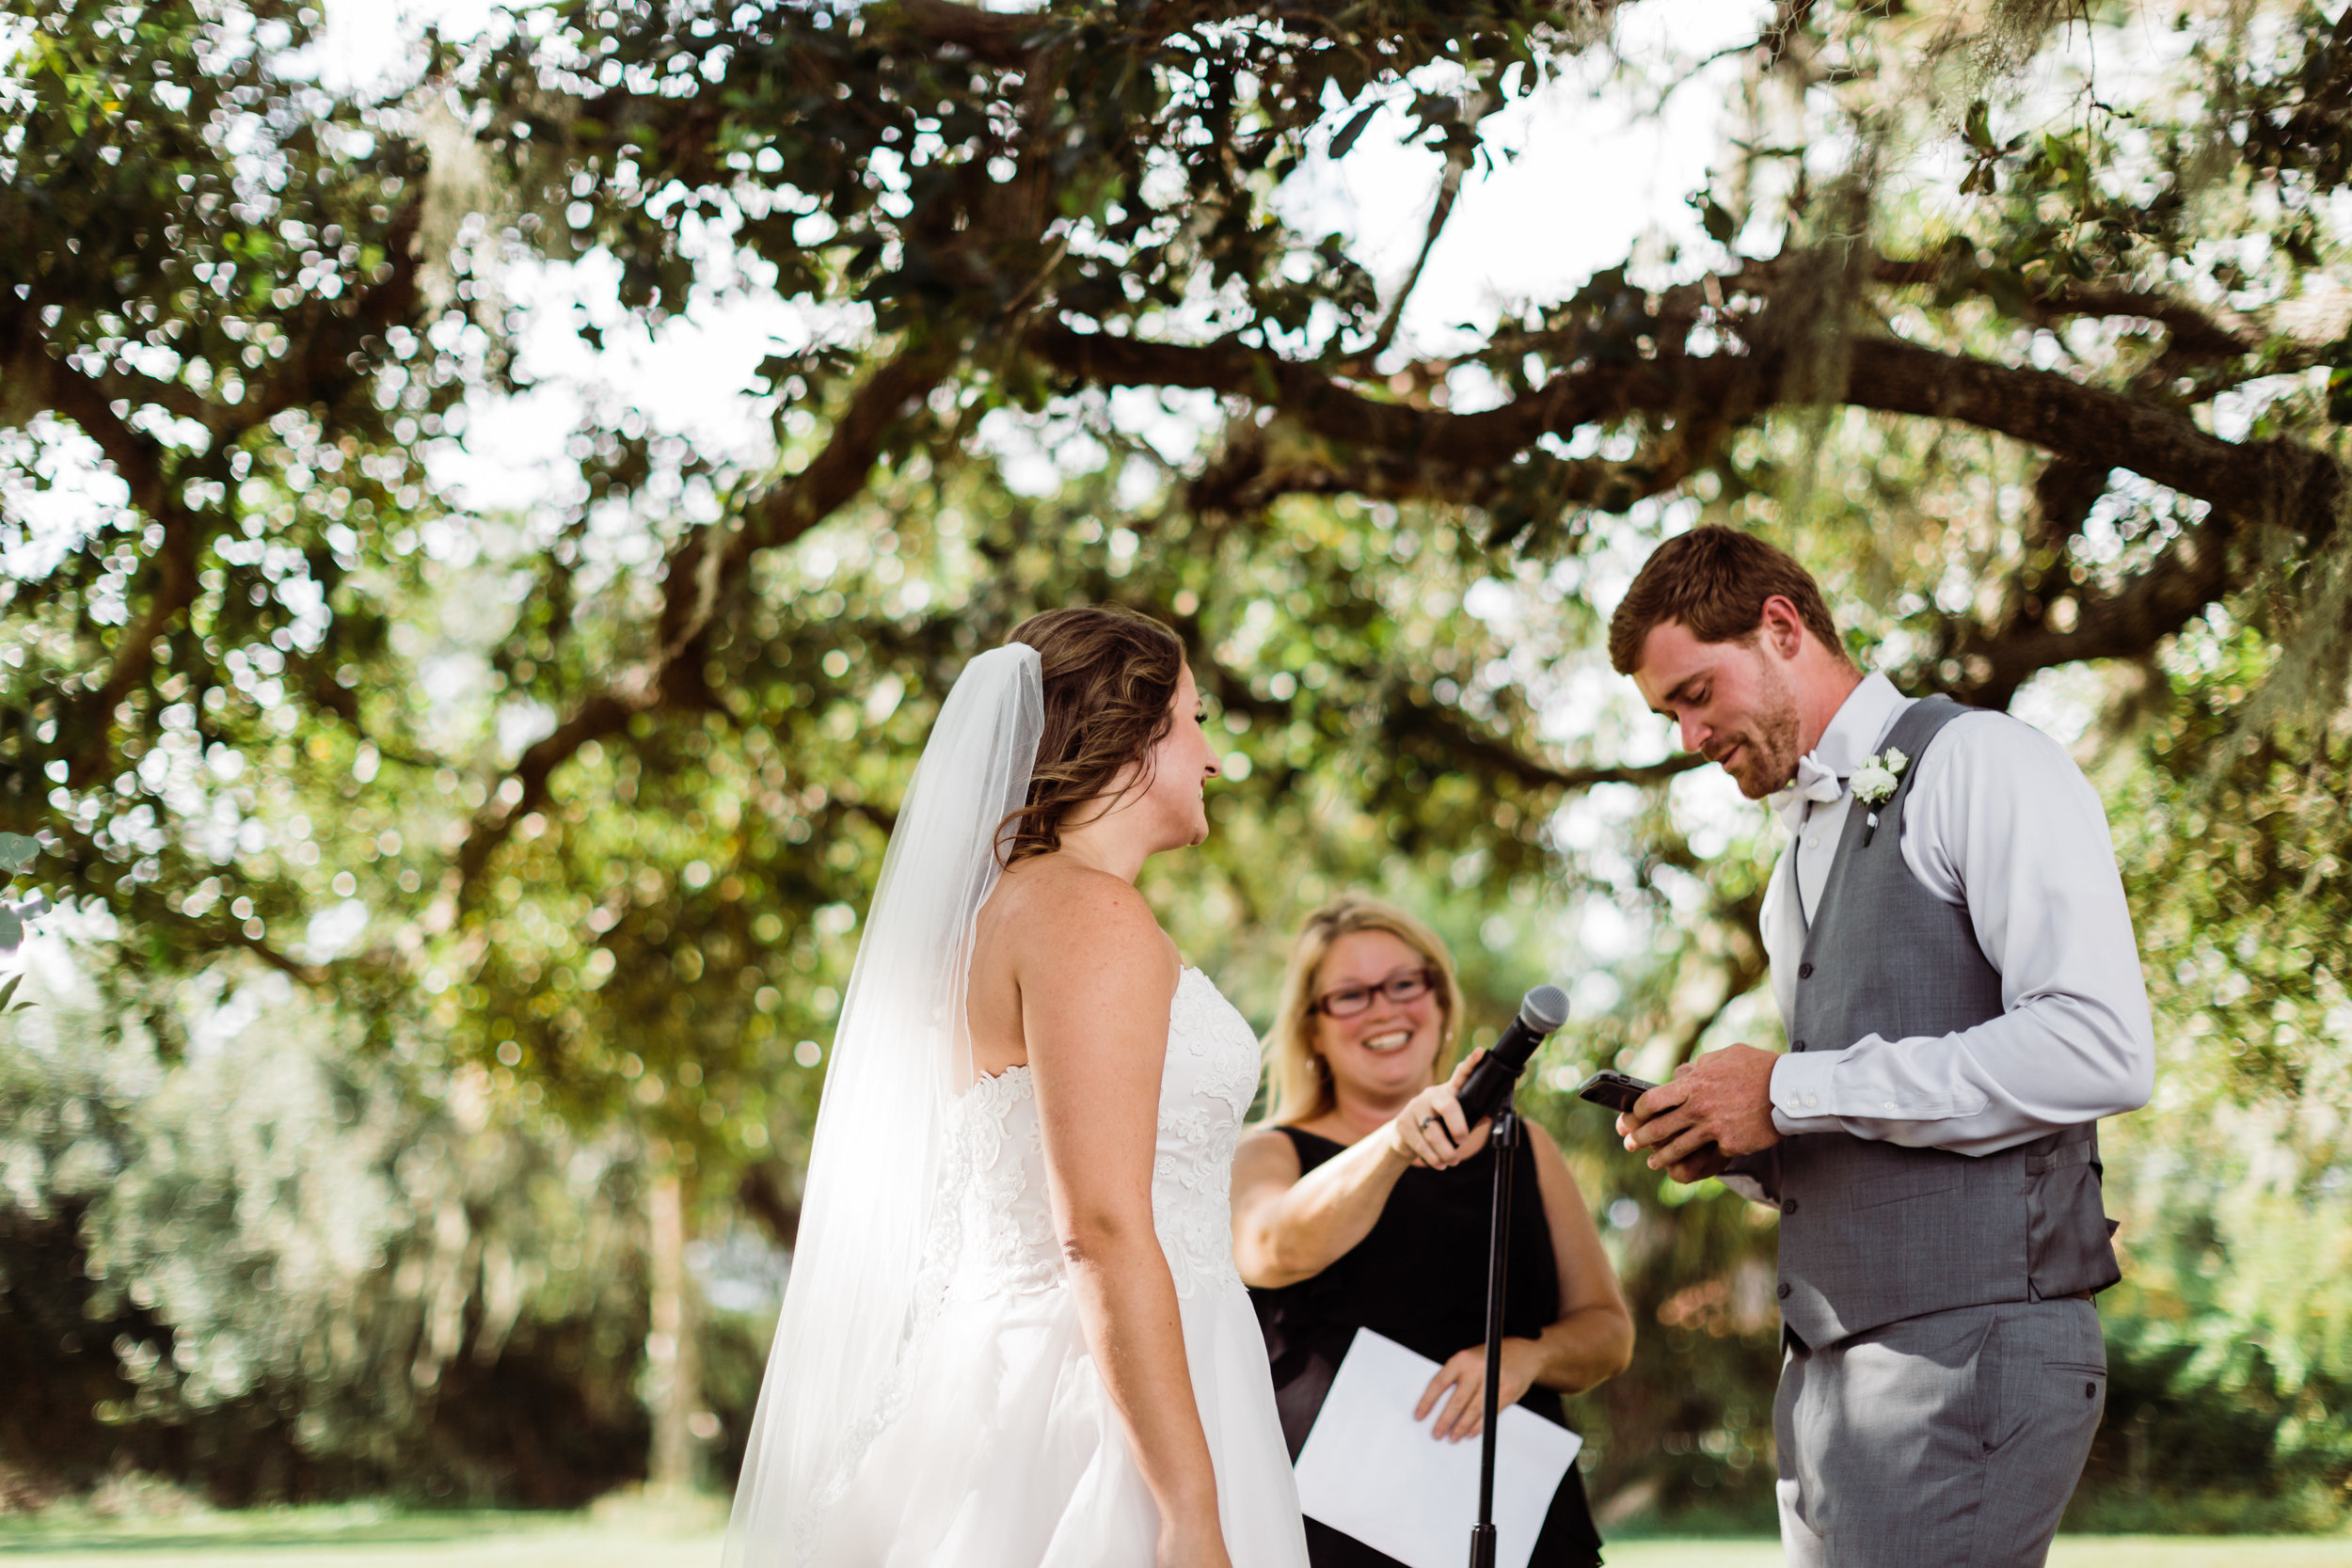 2017.10.14 Samantha and Matthew Crabtree Sarasota Wedding (162 of 708).jpg